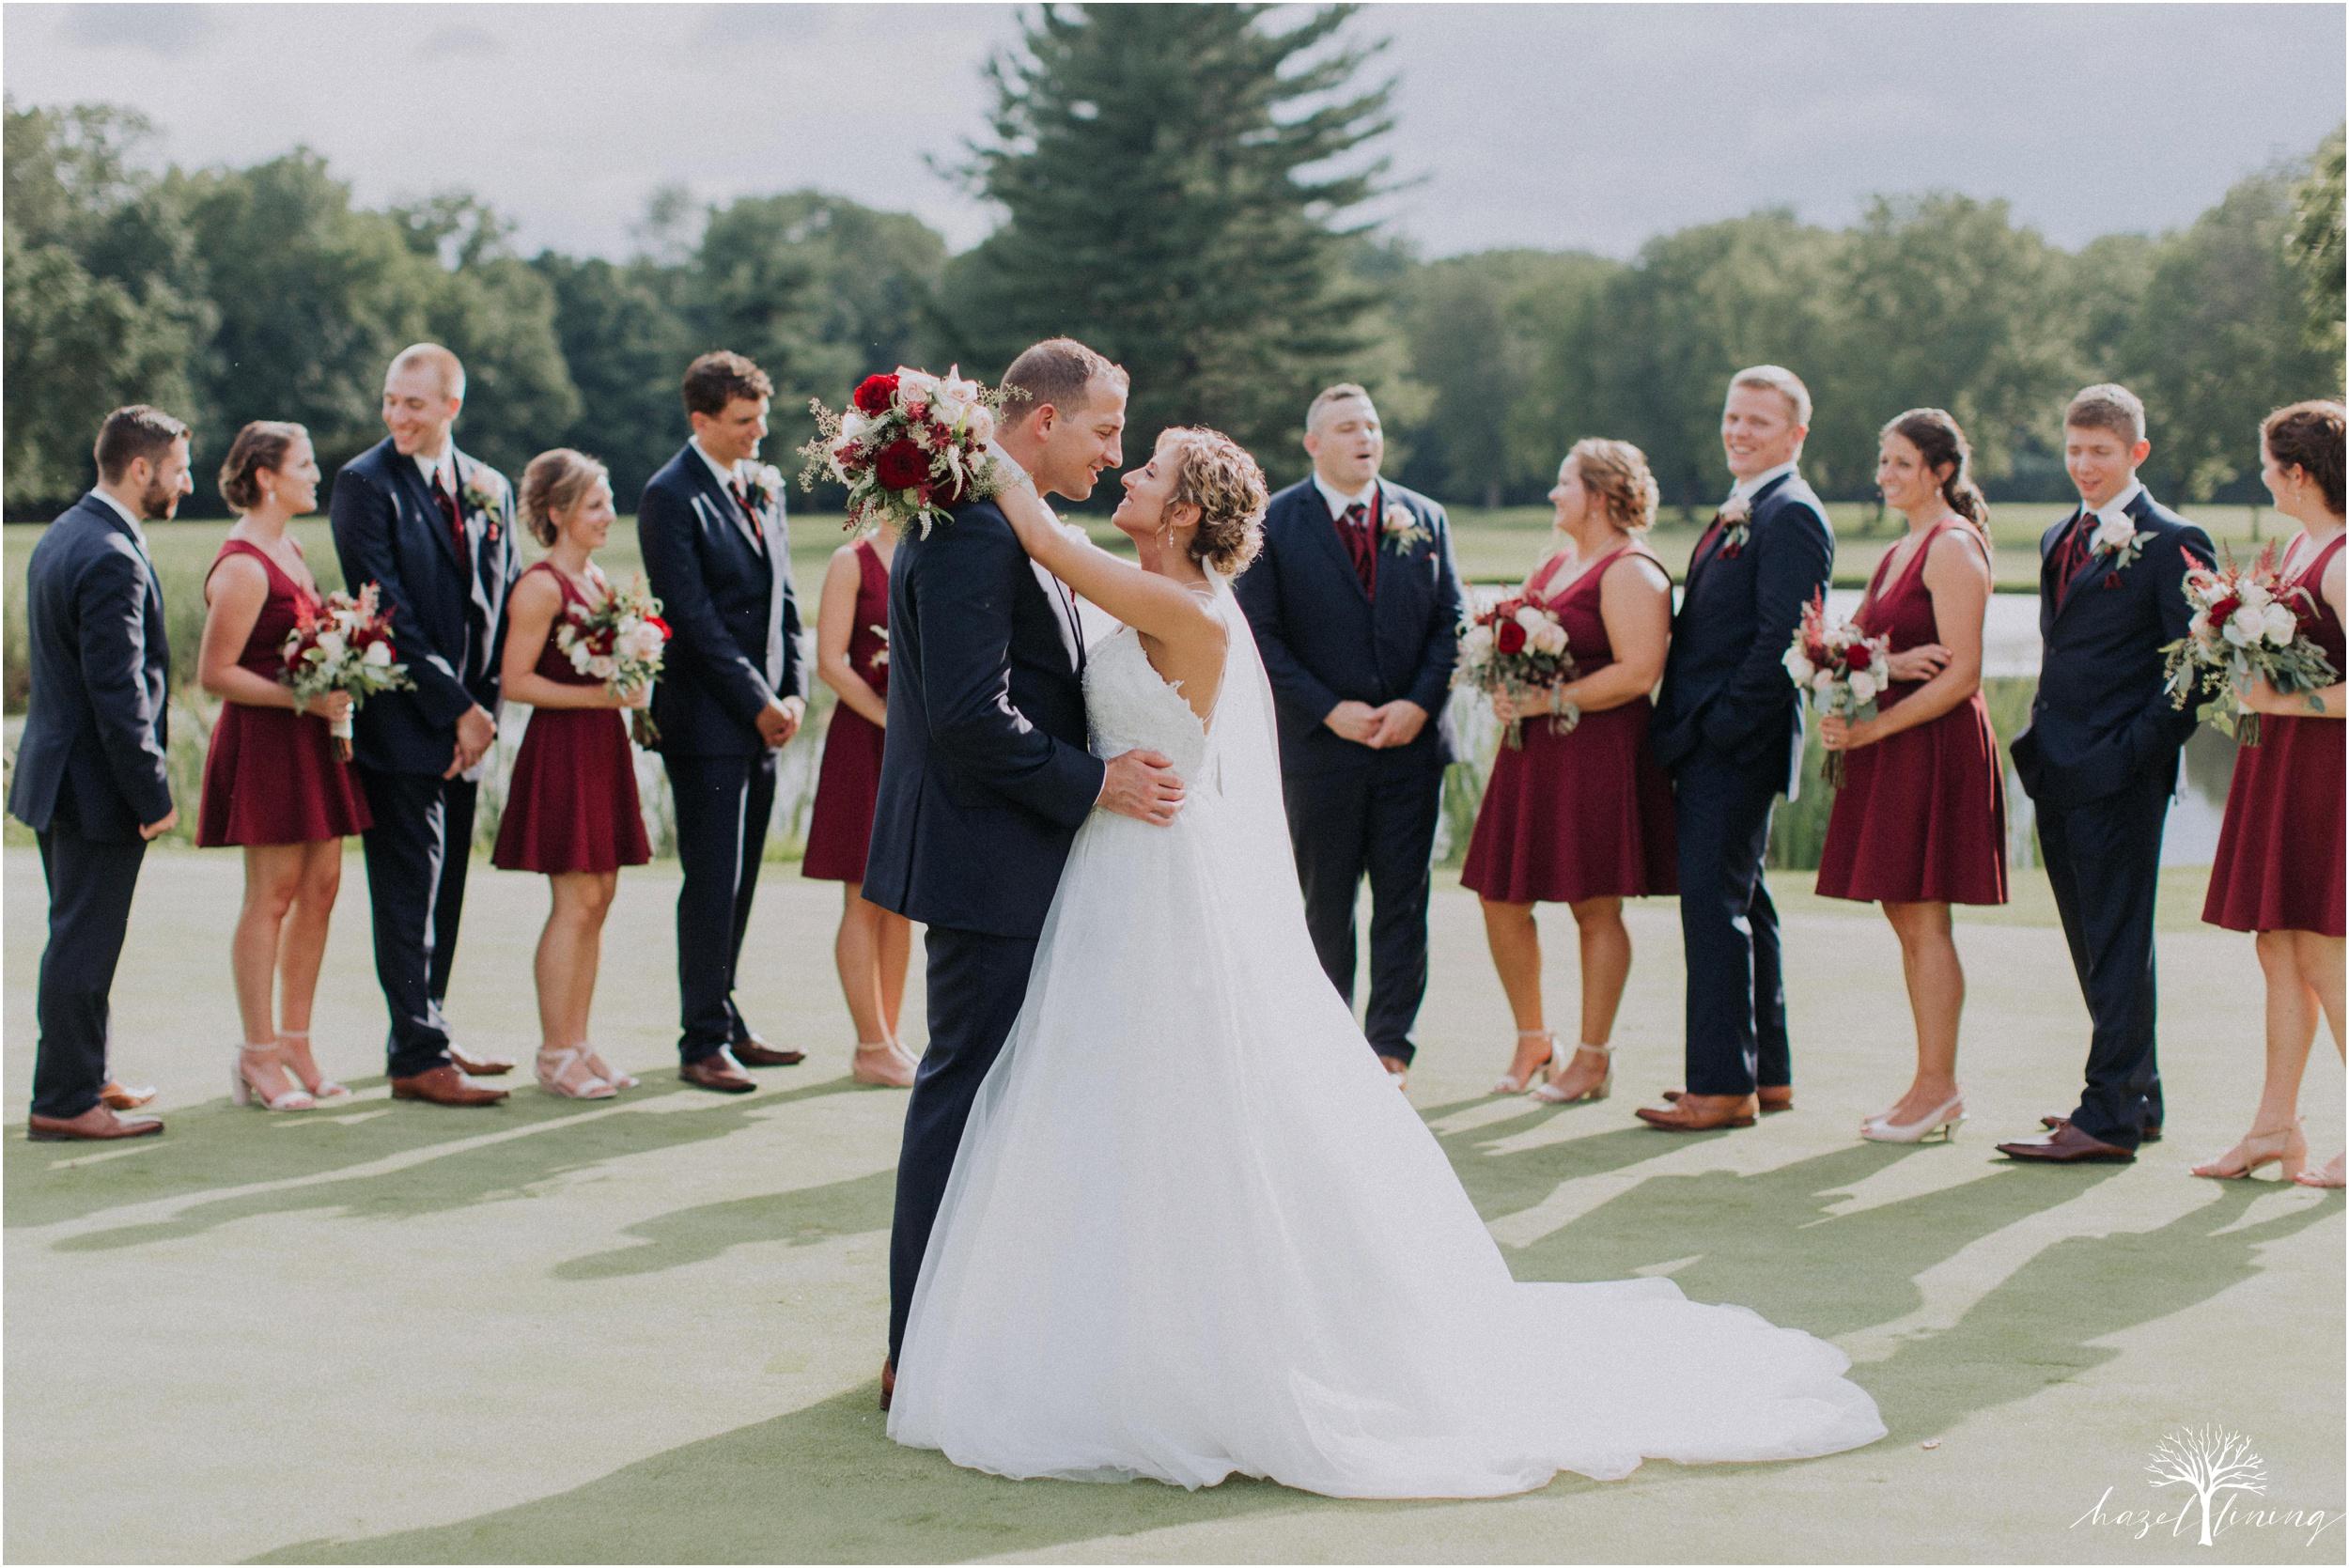 jonathan-weibel-becky-haywood-loft-at-sweetwater-cc-pennsburg-pennsylvania-rainy-day-summer-wedding-hazel-lining-travel-wedding-elopement-photography_0062.jpg